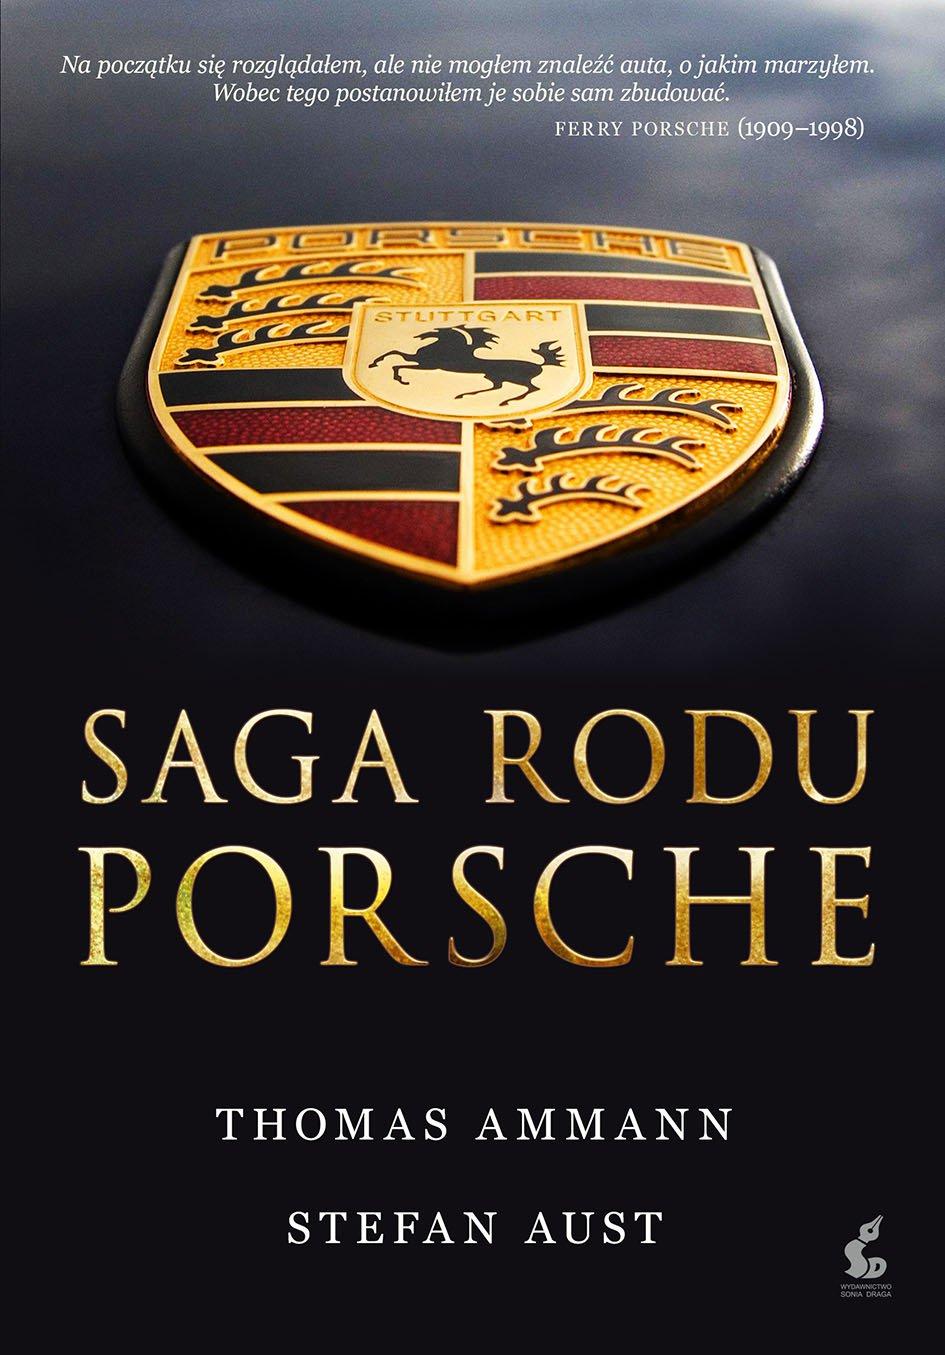 Saga rodu Porsche - Ebook (Książka EPUB) do pobrania w formacie EPUB